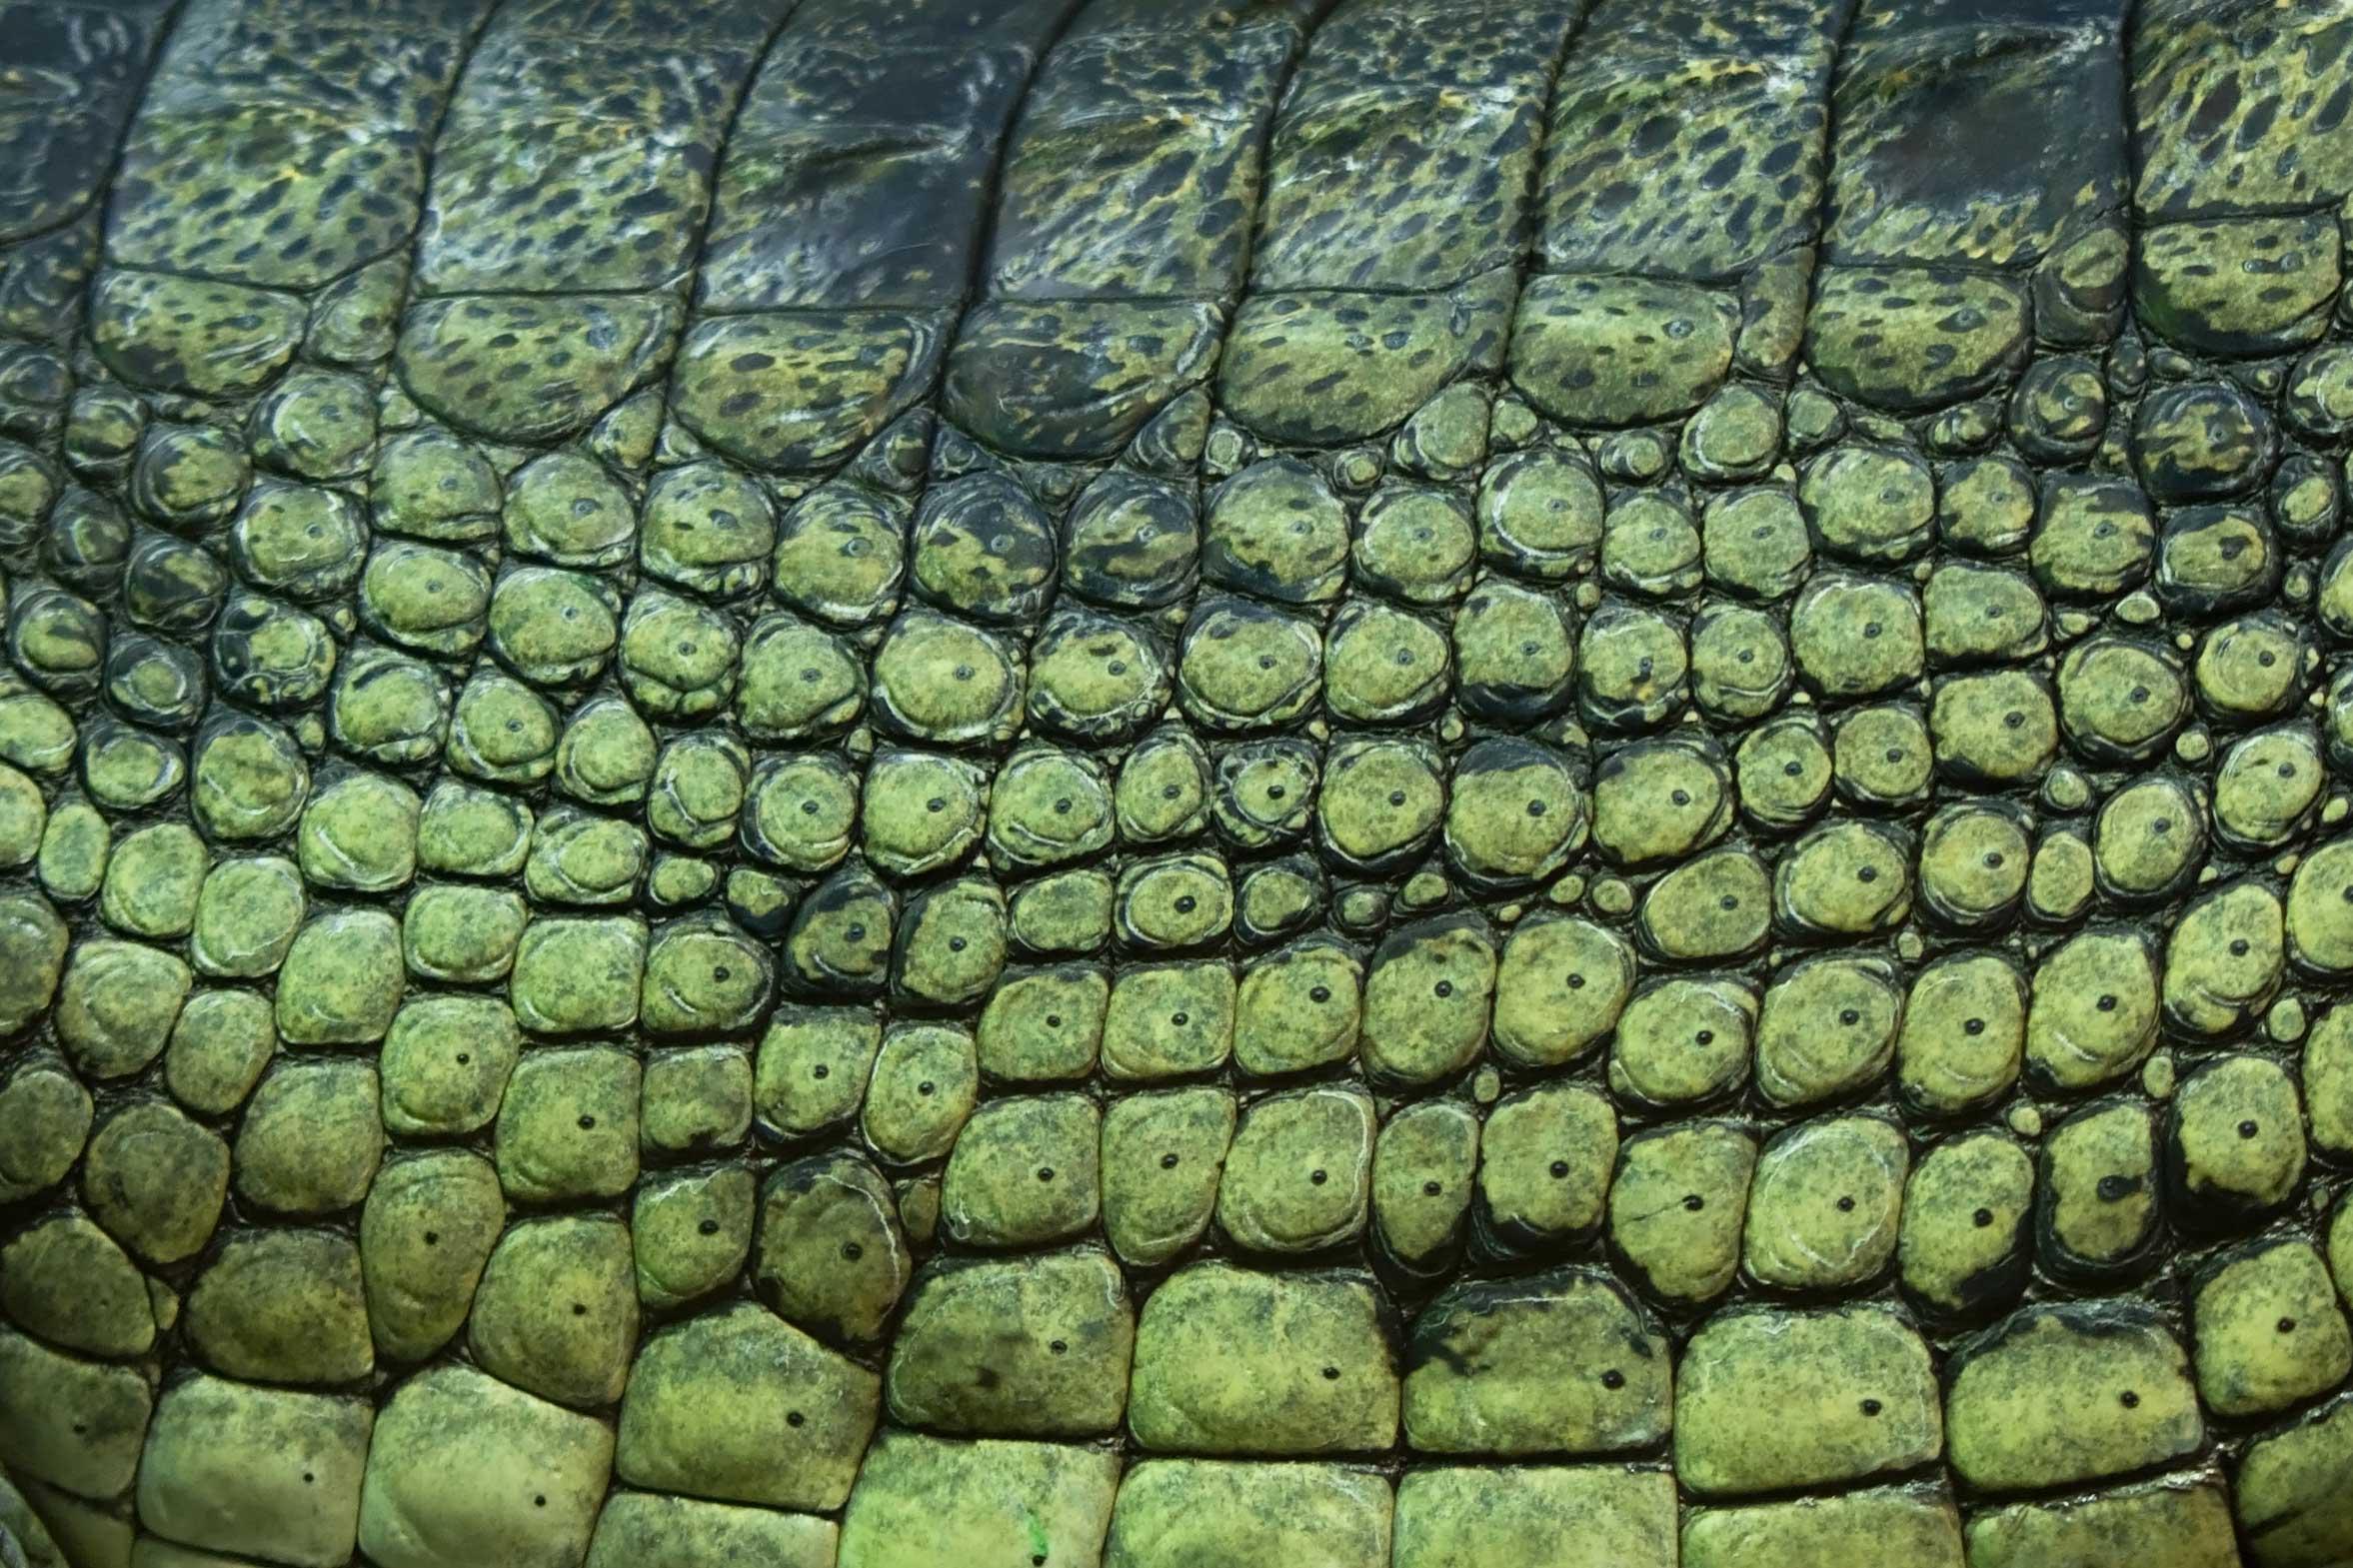 scaly reptile skin